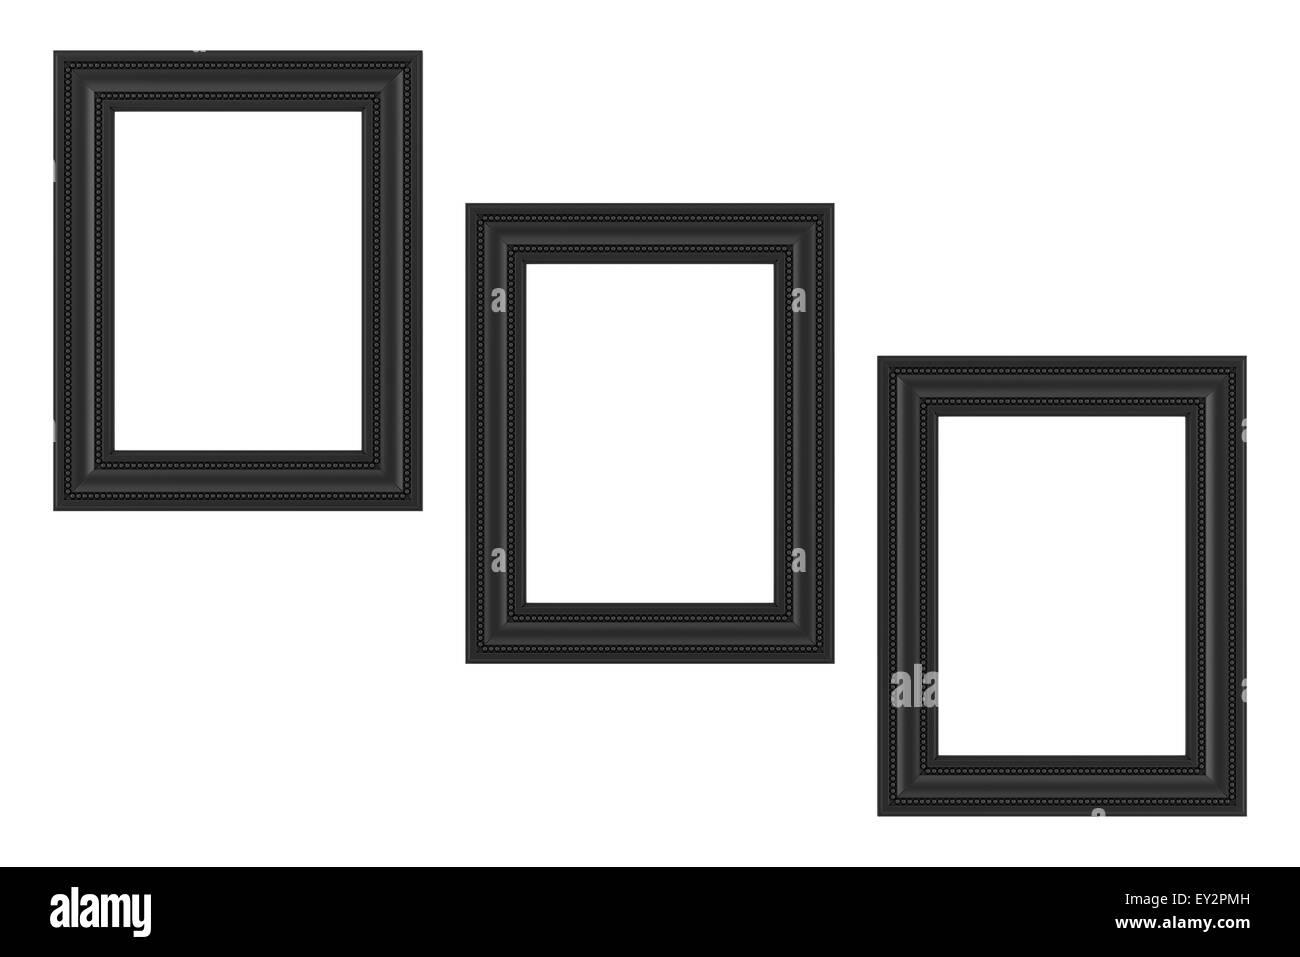 Triptych Frame Stock Photos & Triptych Frame Stock Images - Alamy